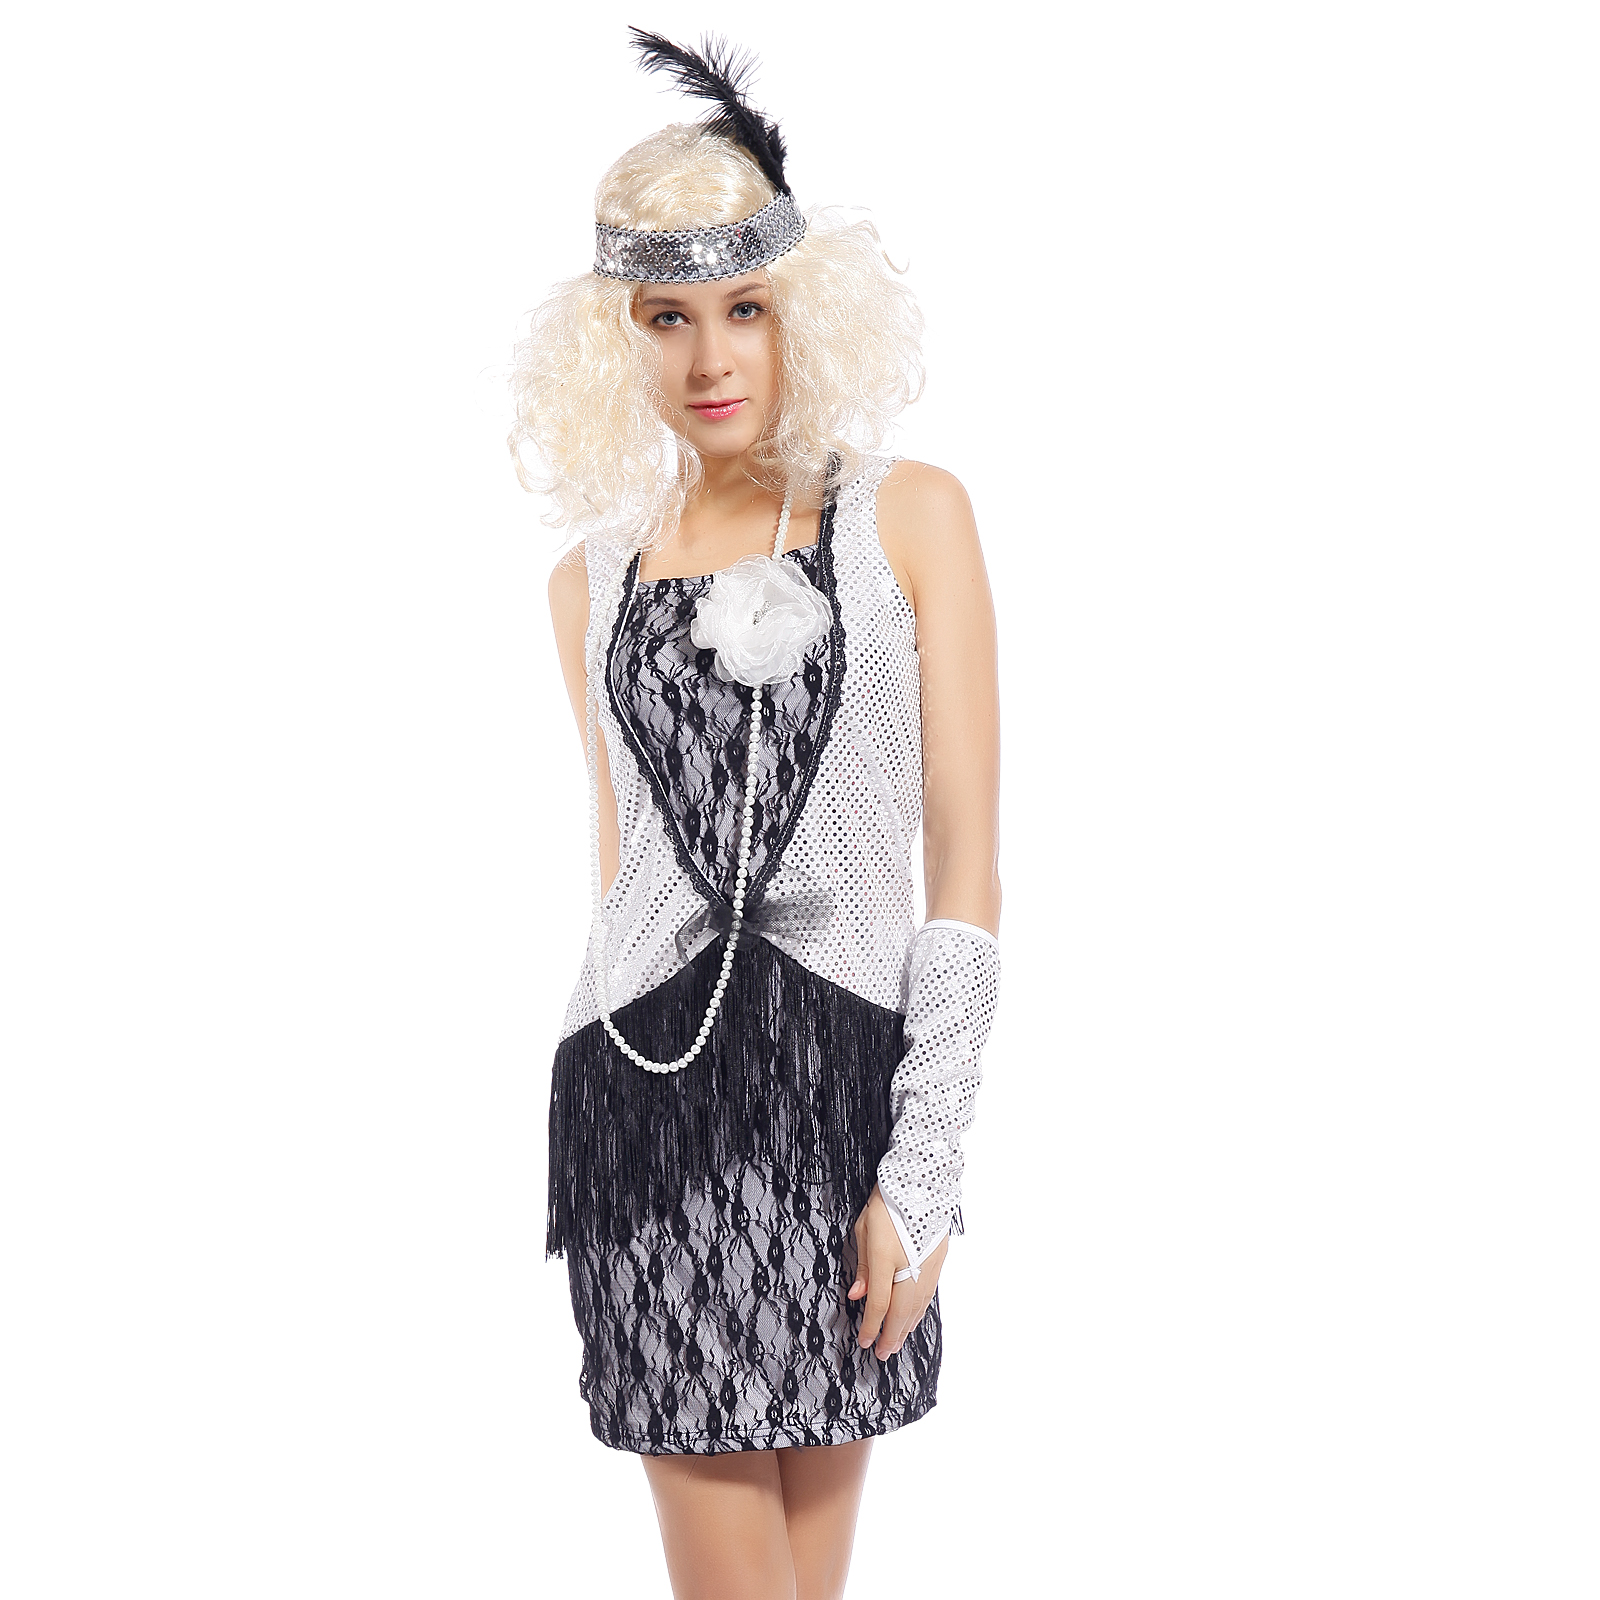 charleston 20er jahre flapper kost m fasching karneval verkleidung flapperkleid ebay. Black Bedroom Furniture Sets. Home Design Ideas